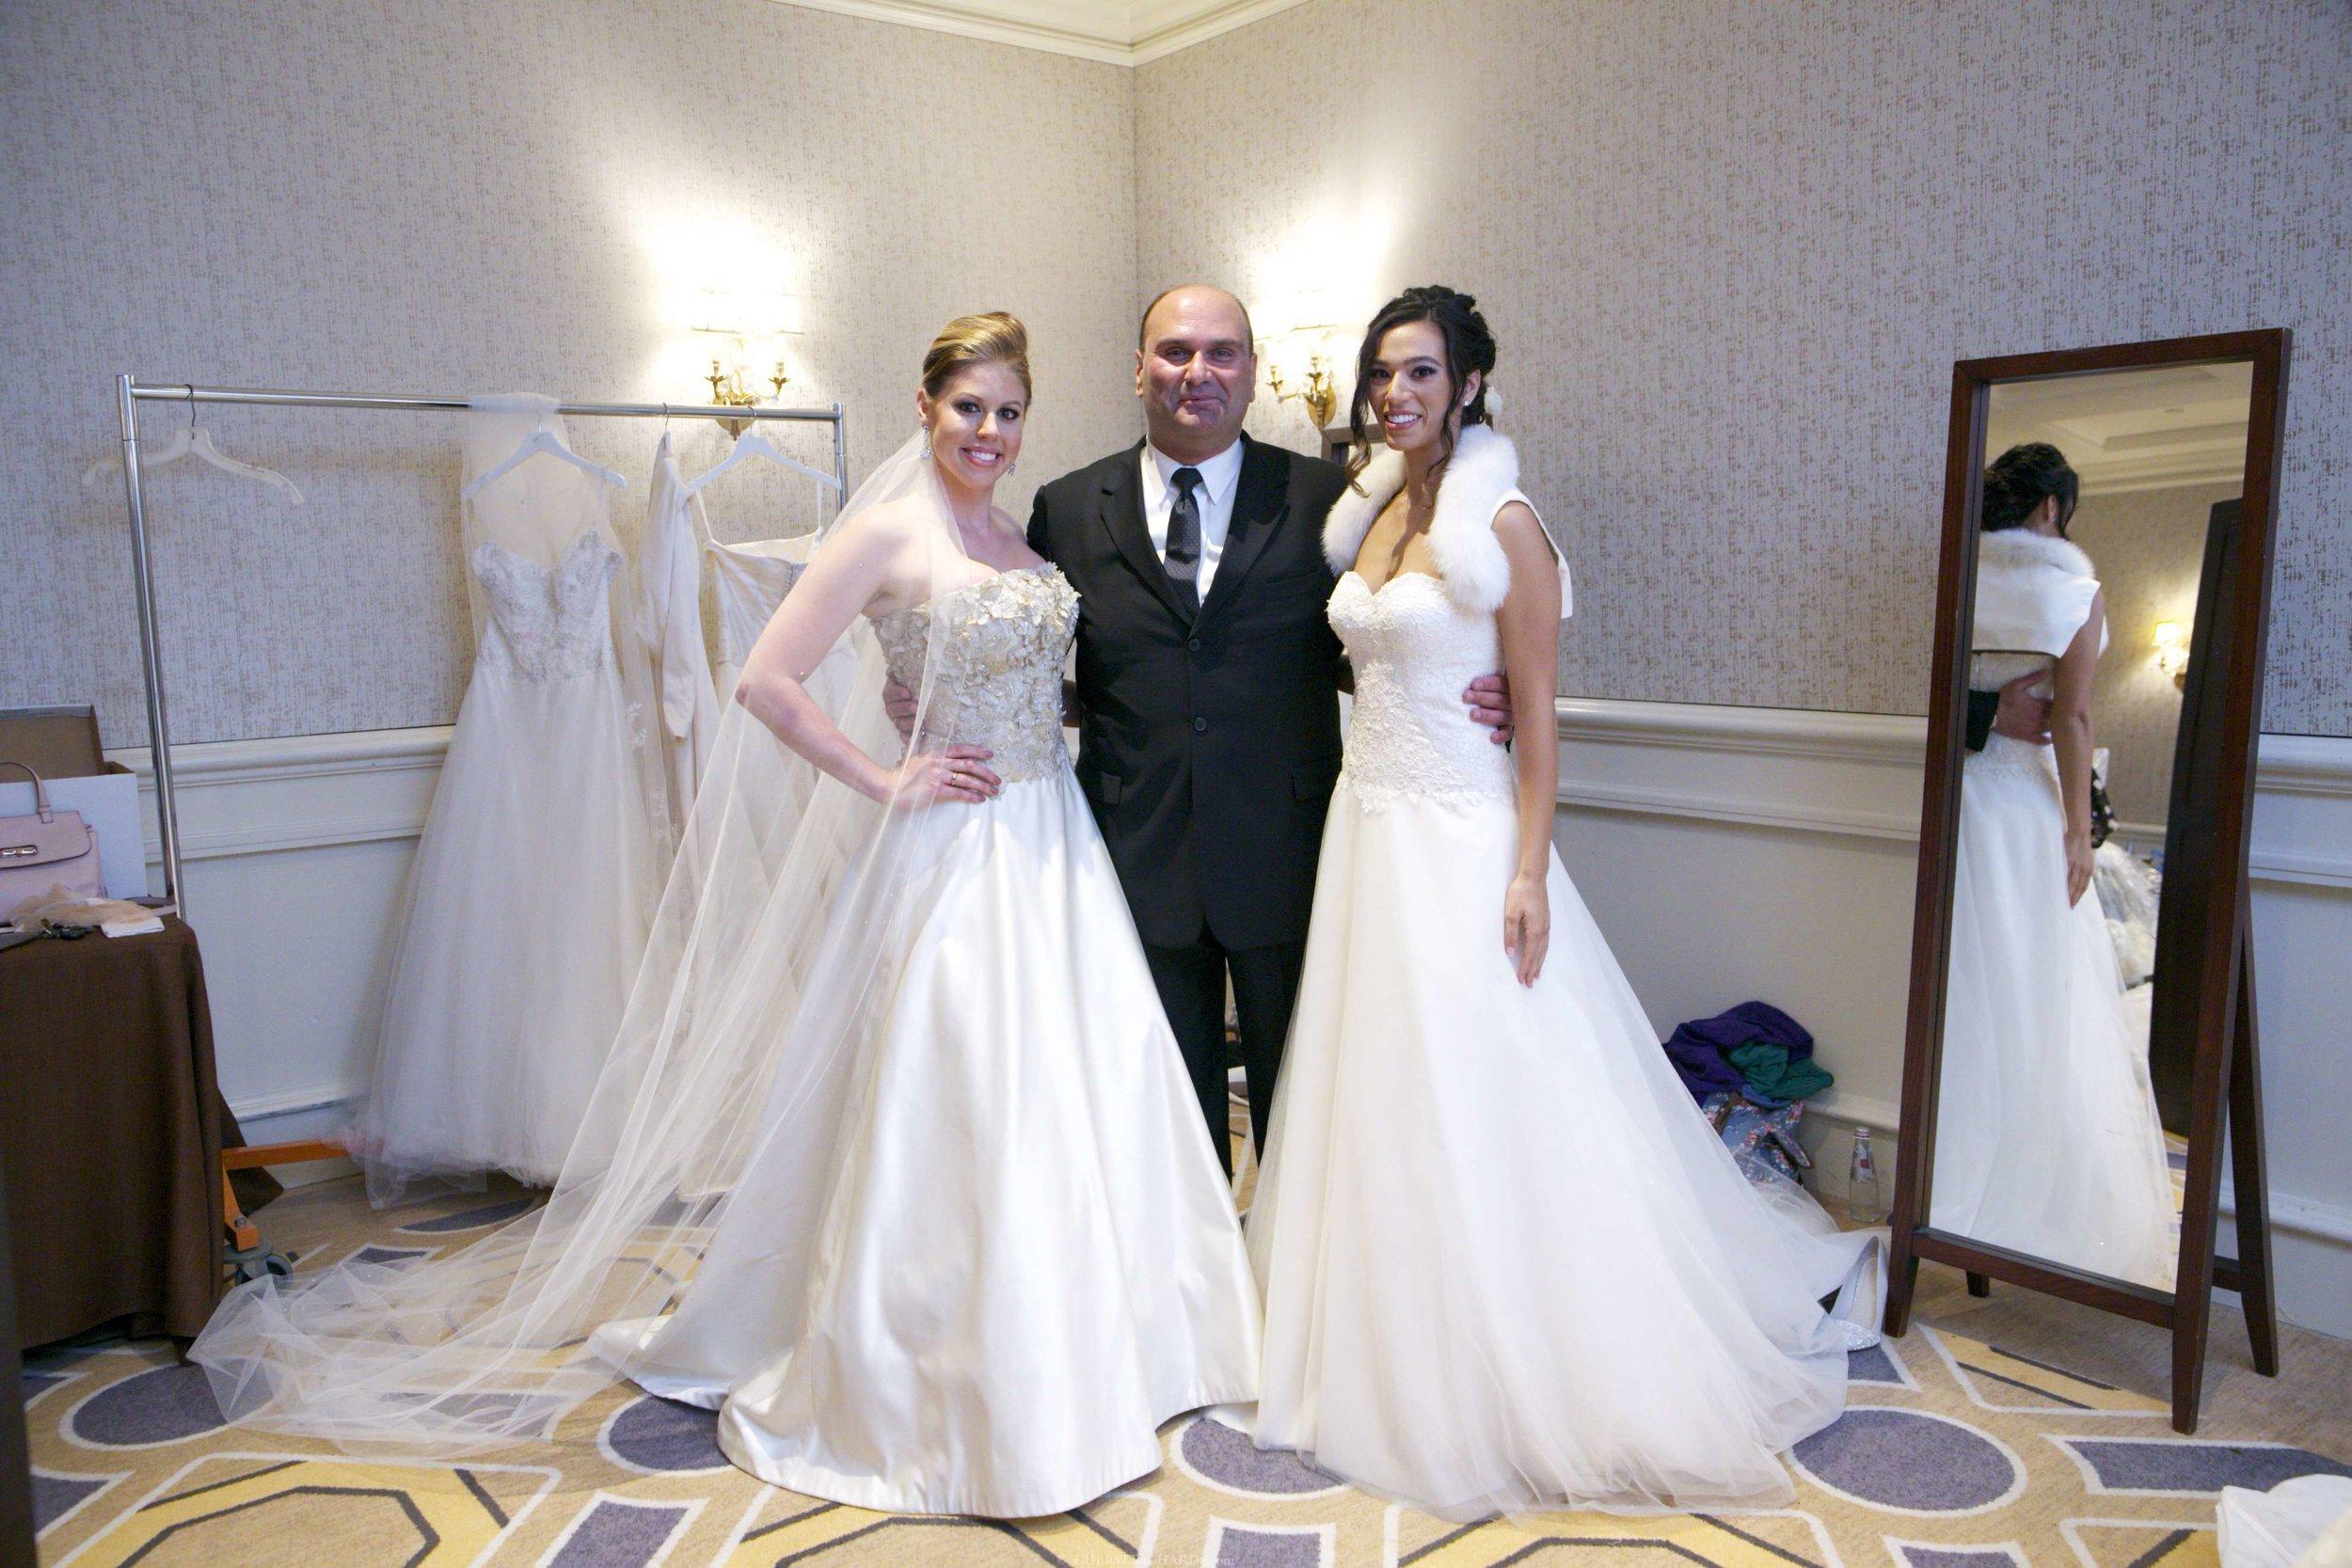 Wedding Launch photos CherylRIchards 0030.jpg